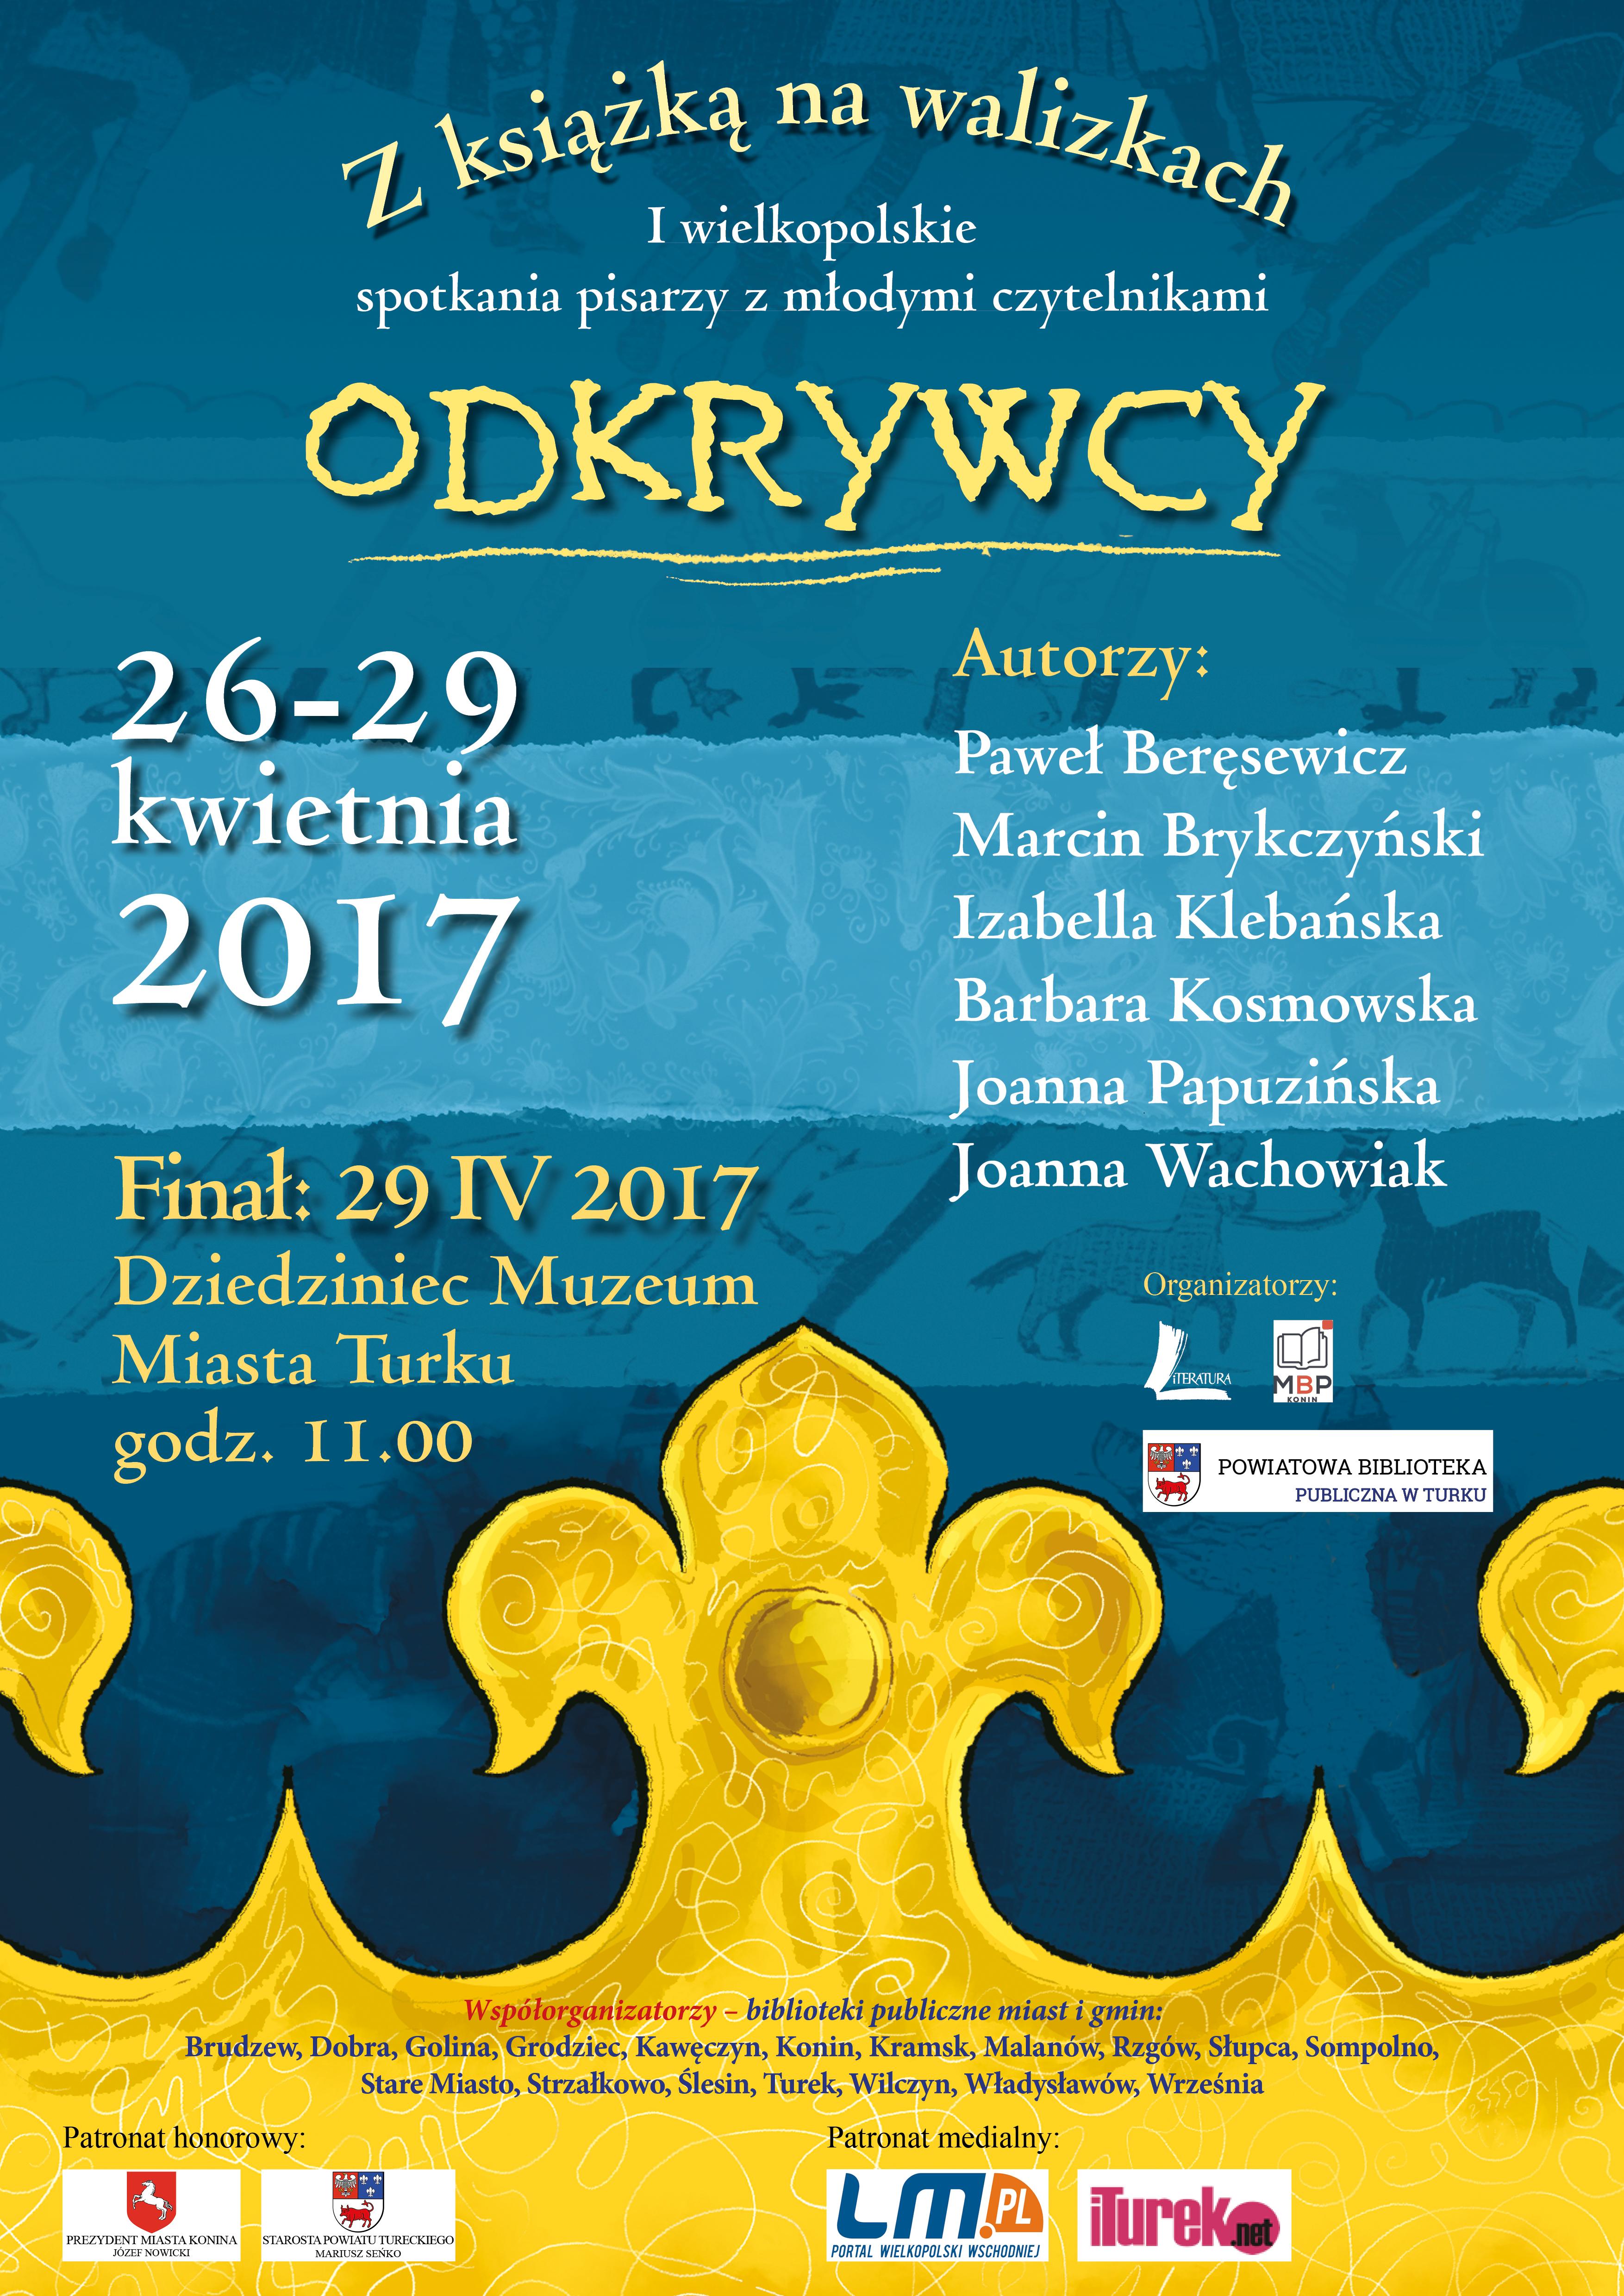 Plakat walizki wielkopolskie 2017 POP